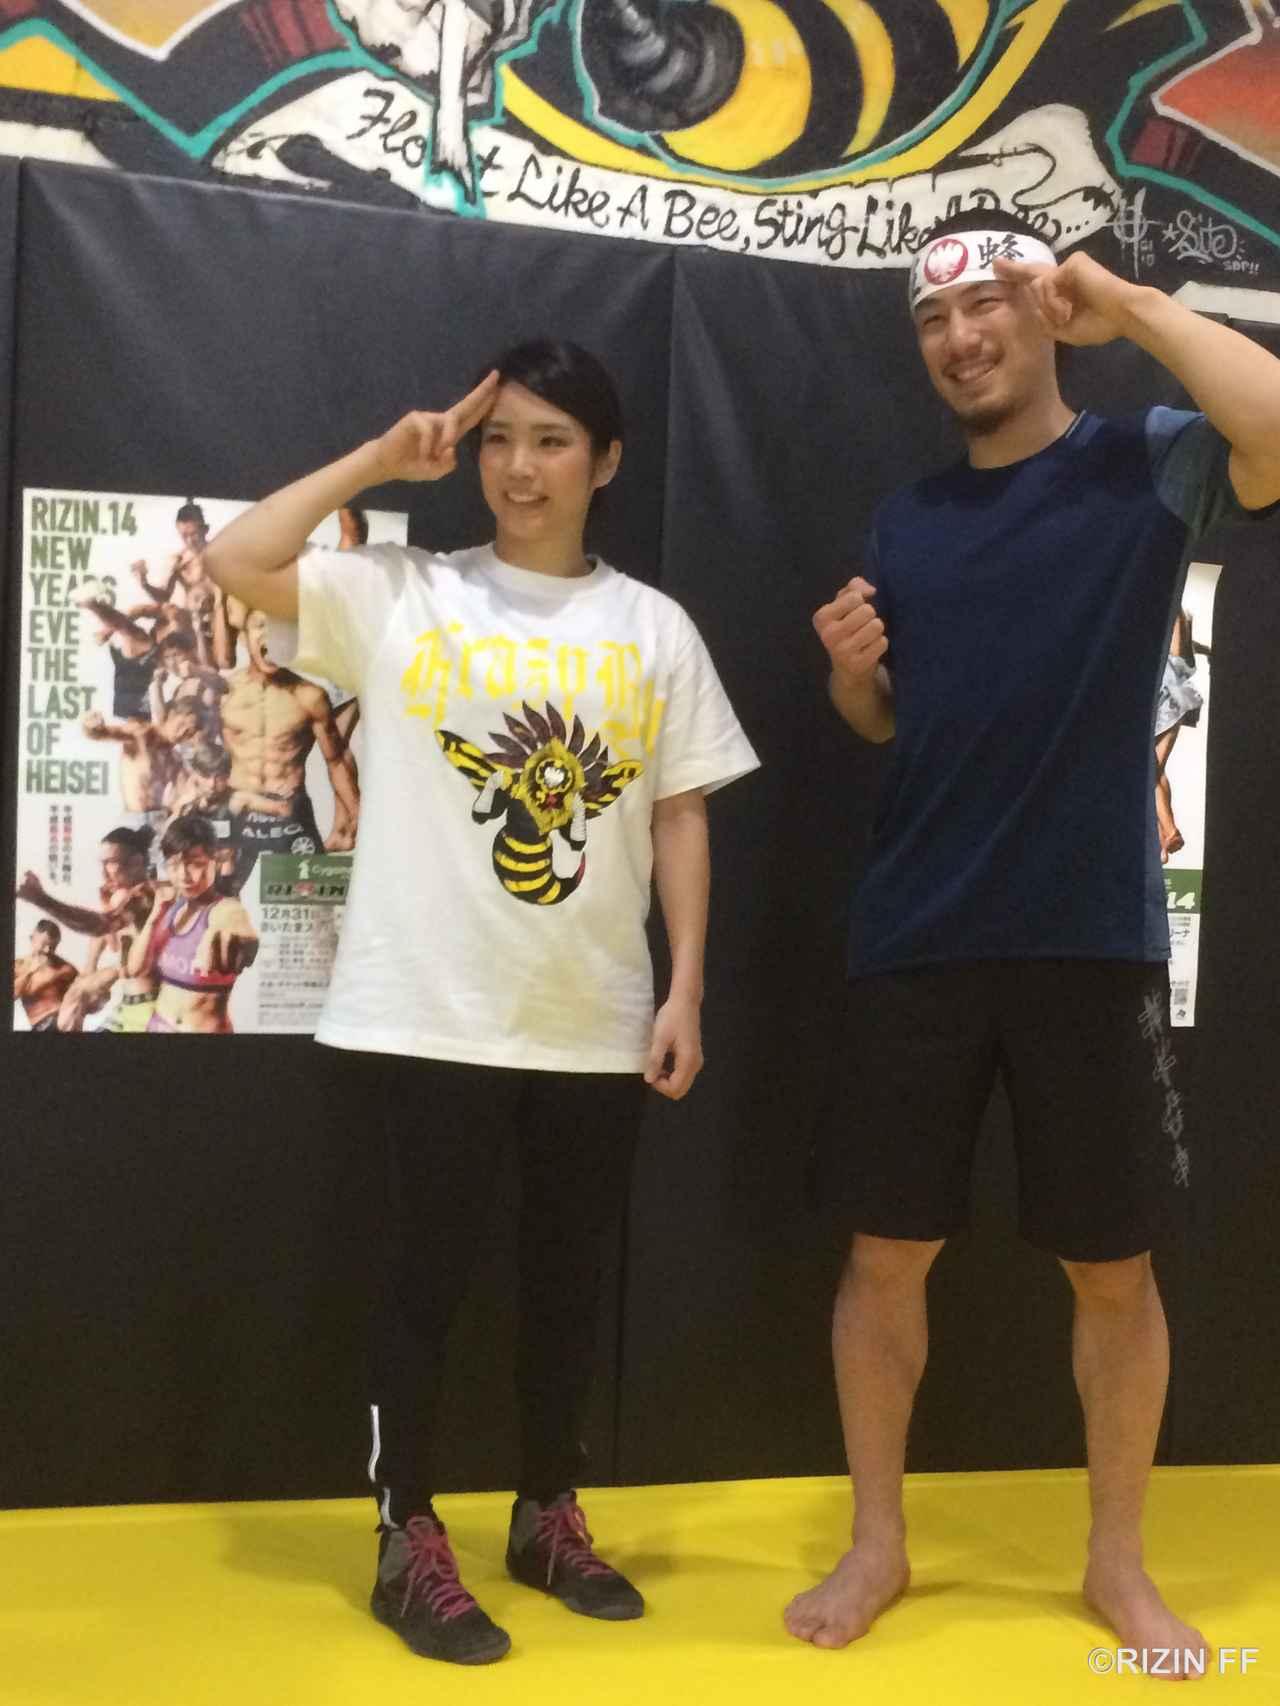 画像3: 【公開練習】 『Cygames presents RIZIN.14』矢地祐介が公開練習!!